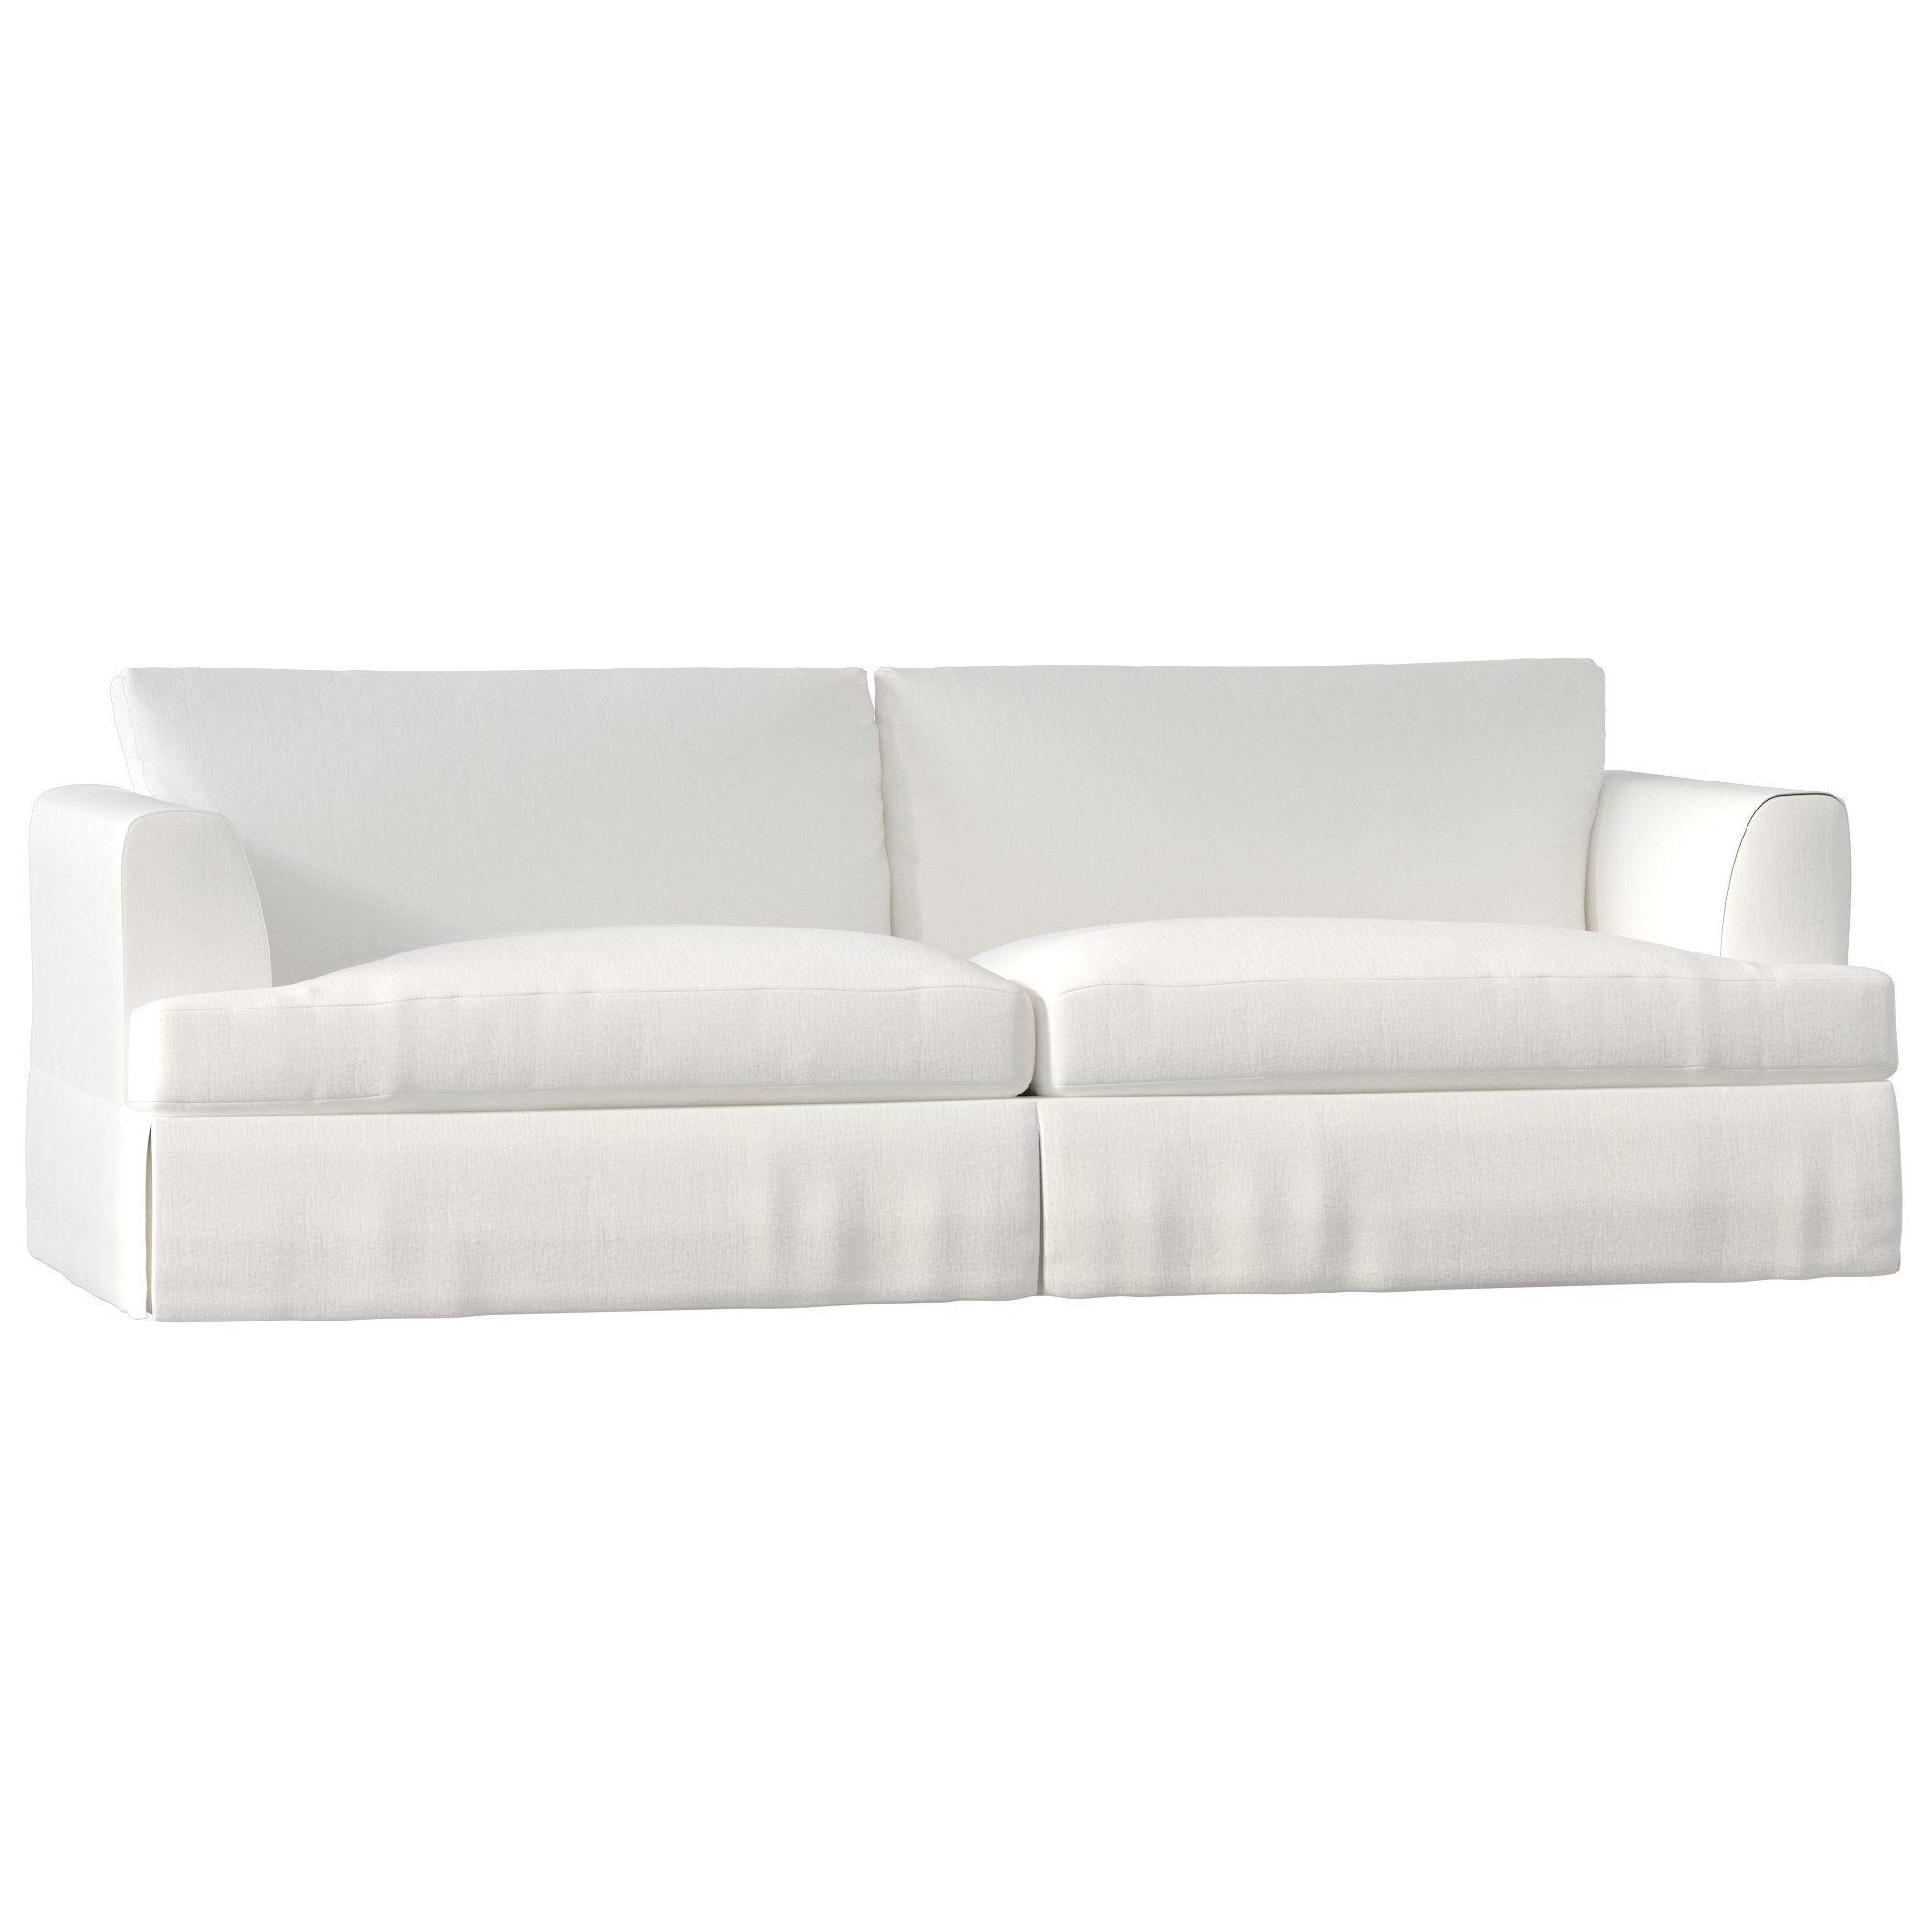 Fairchild Slipcovered Sofa Joss Main Slipcovered Sofa Sofa